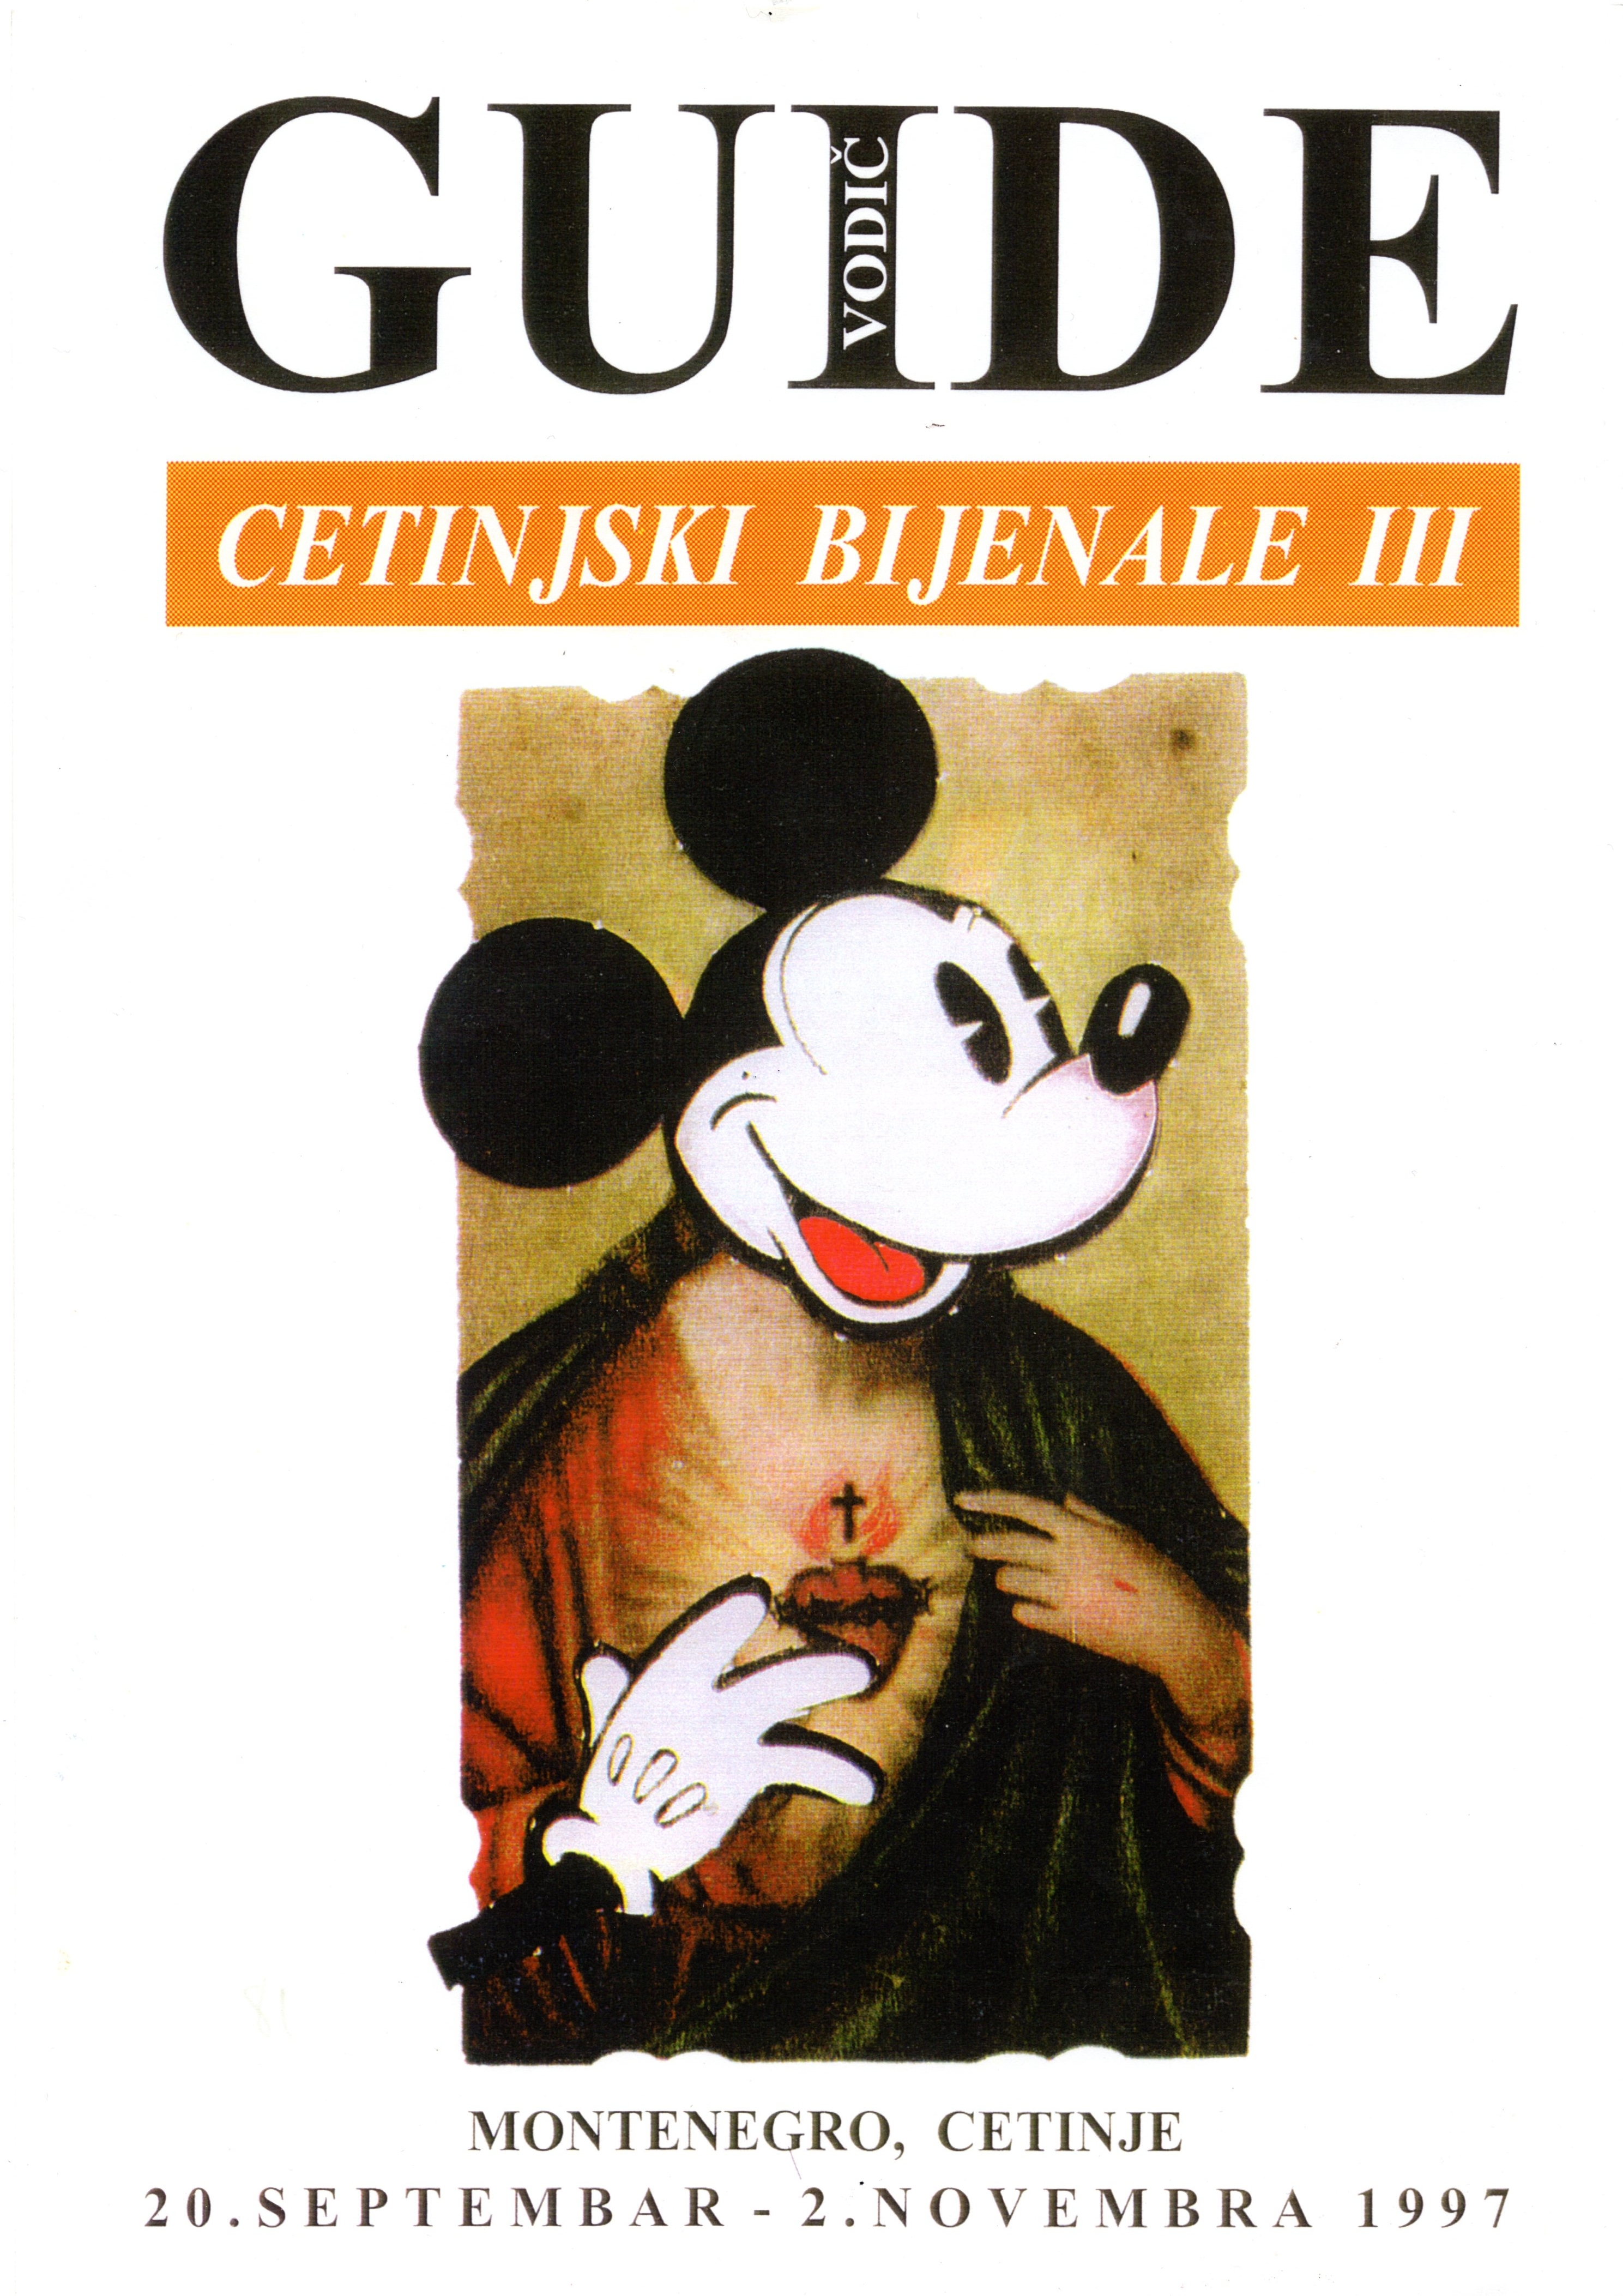 Cetinjsko bijenale